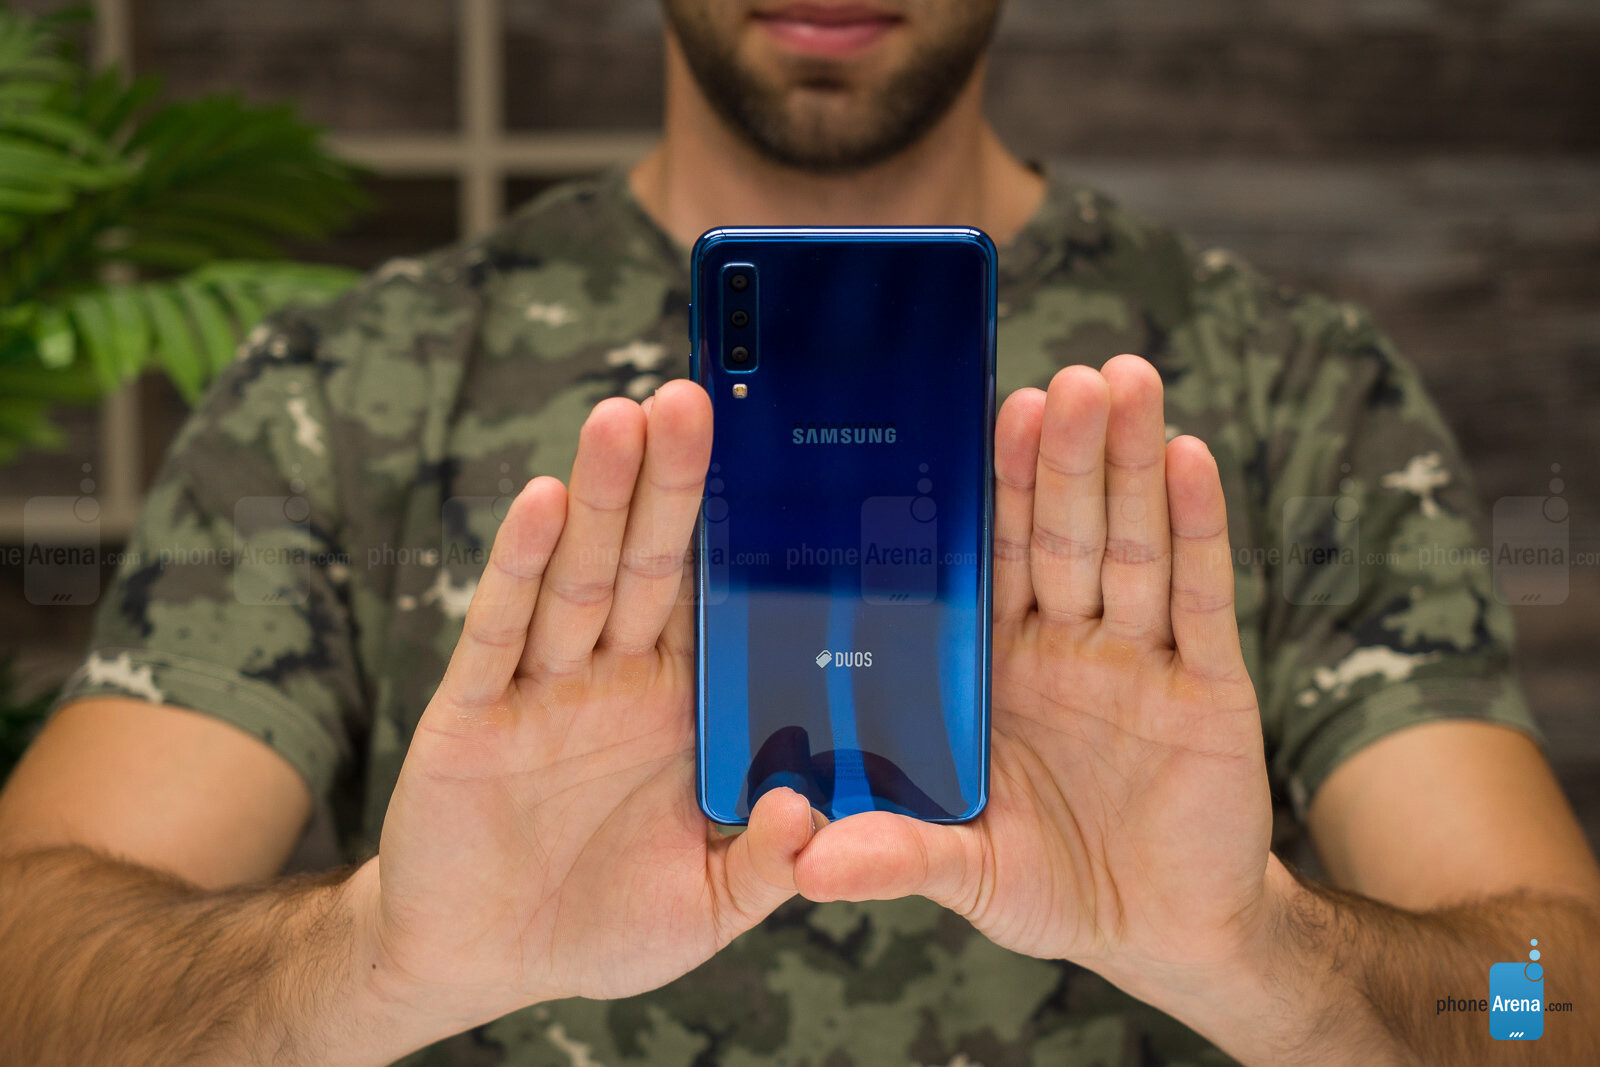 Samsung Galaxy A7 (2018) Review - PhoneArena